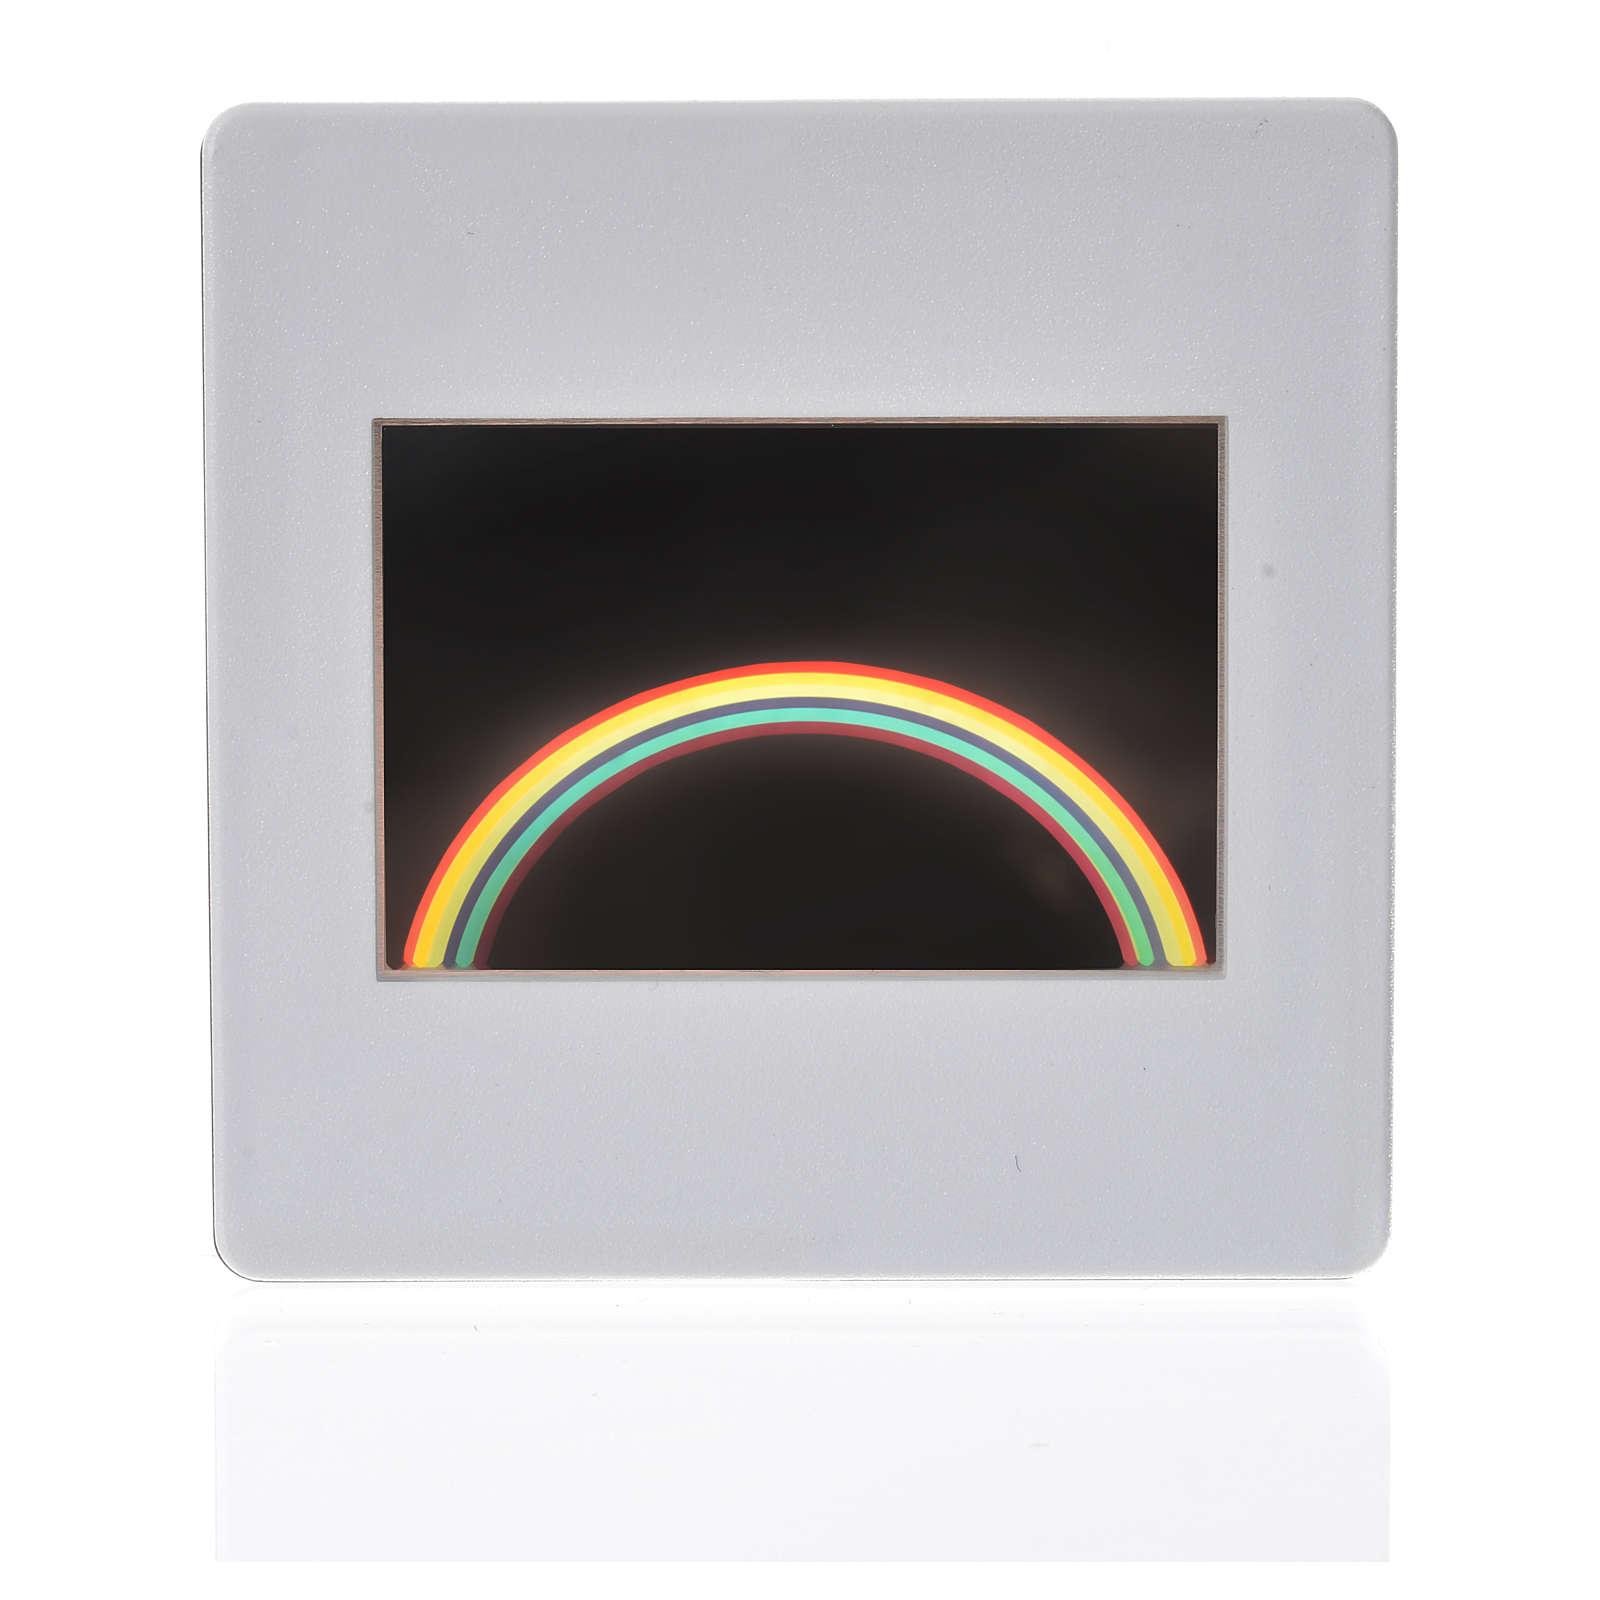 Diapositiva presepe arcobaleno 4